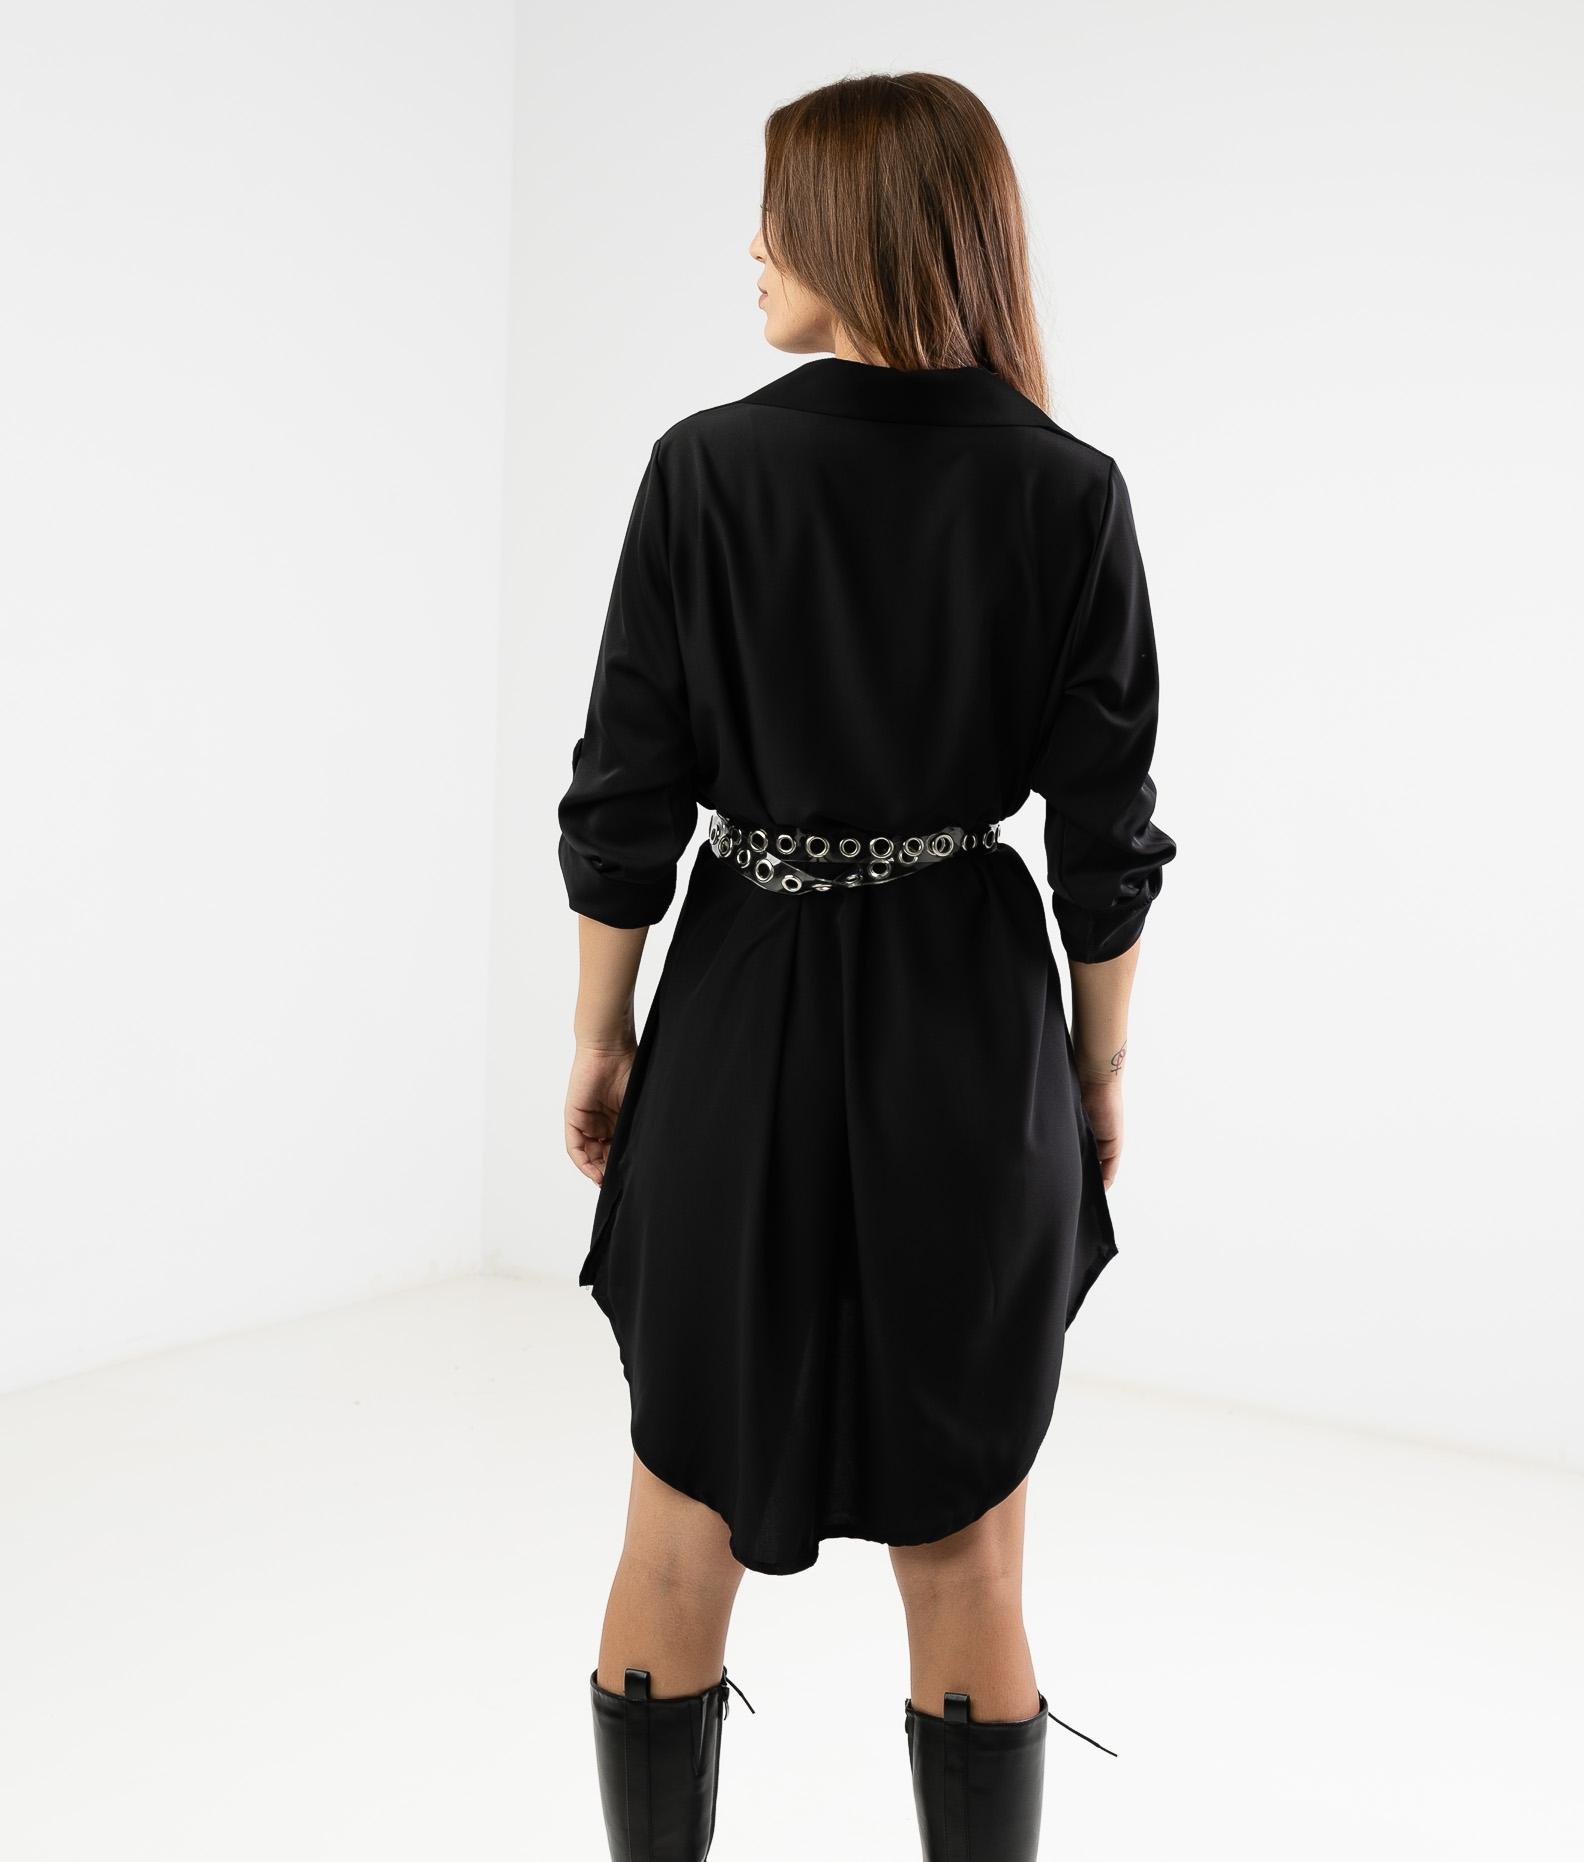 VIMALA DRESS - BLACK